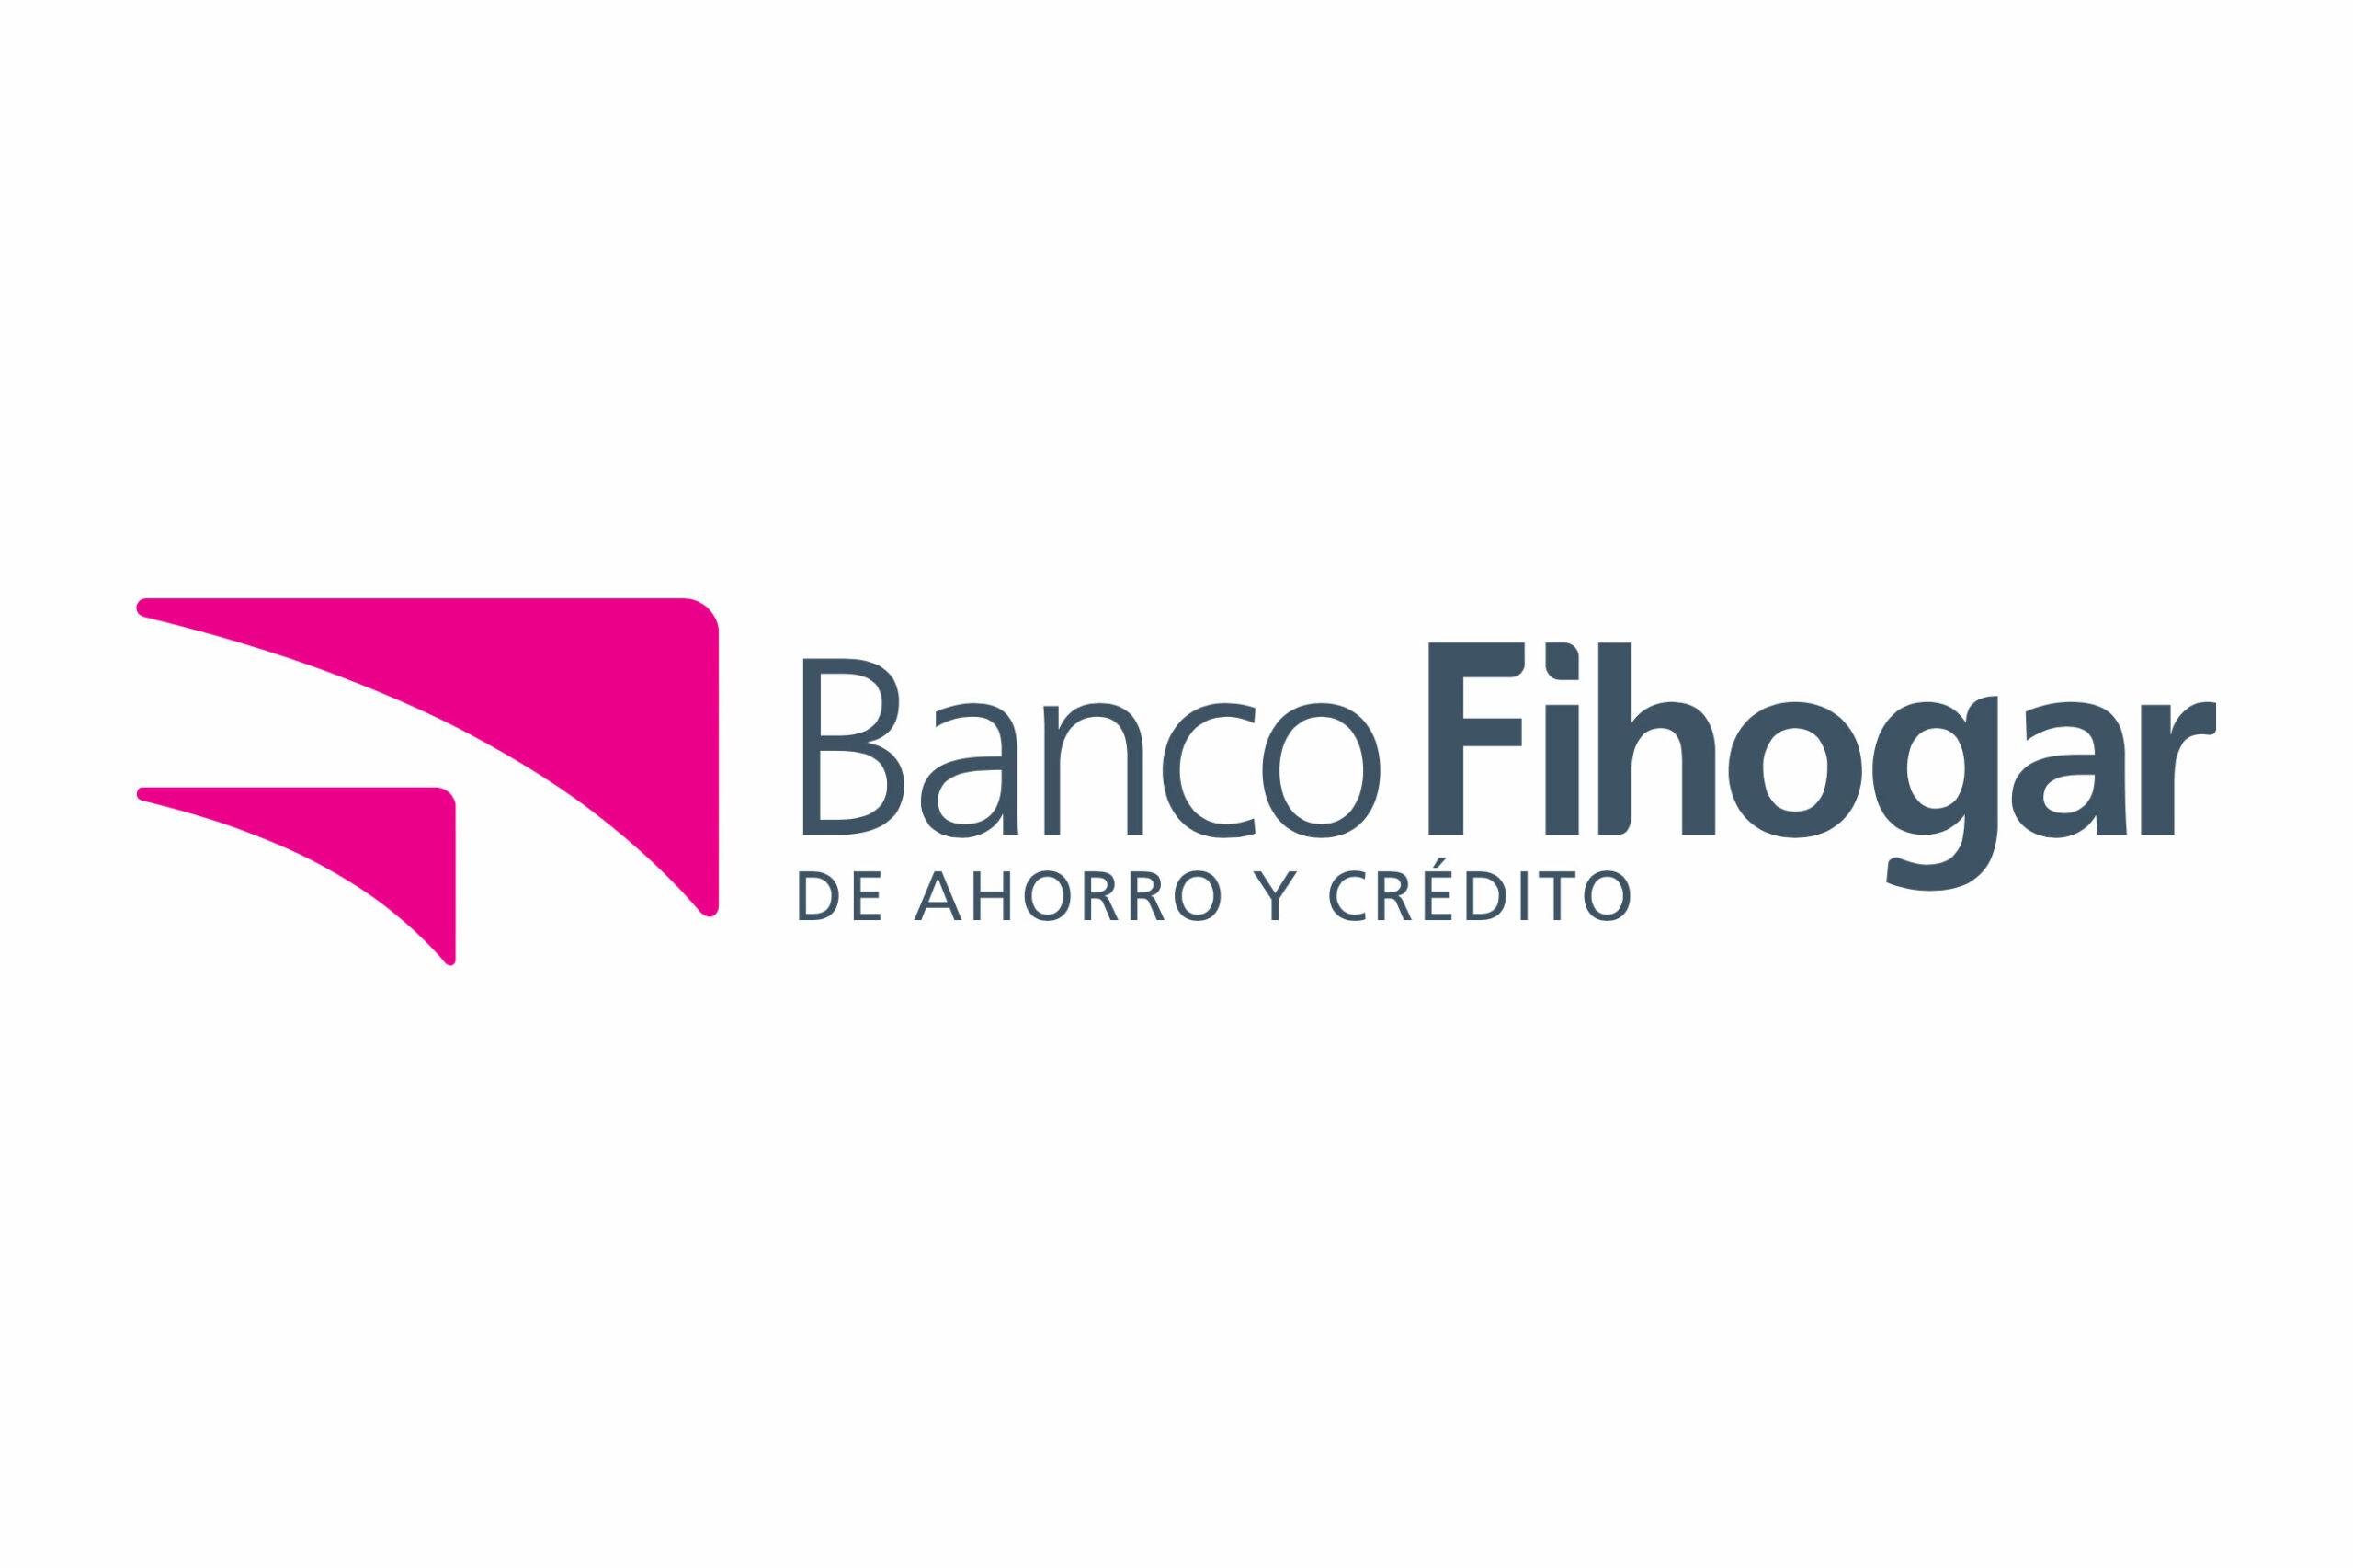 Banco Lafise se integra al ecosistema de GCS - image integración-banco-fihogar-a-mi-punto-scaled-1 on https://gcs-international.com